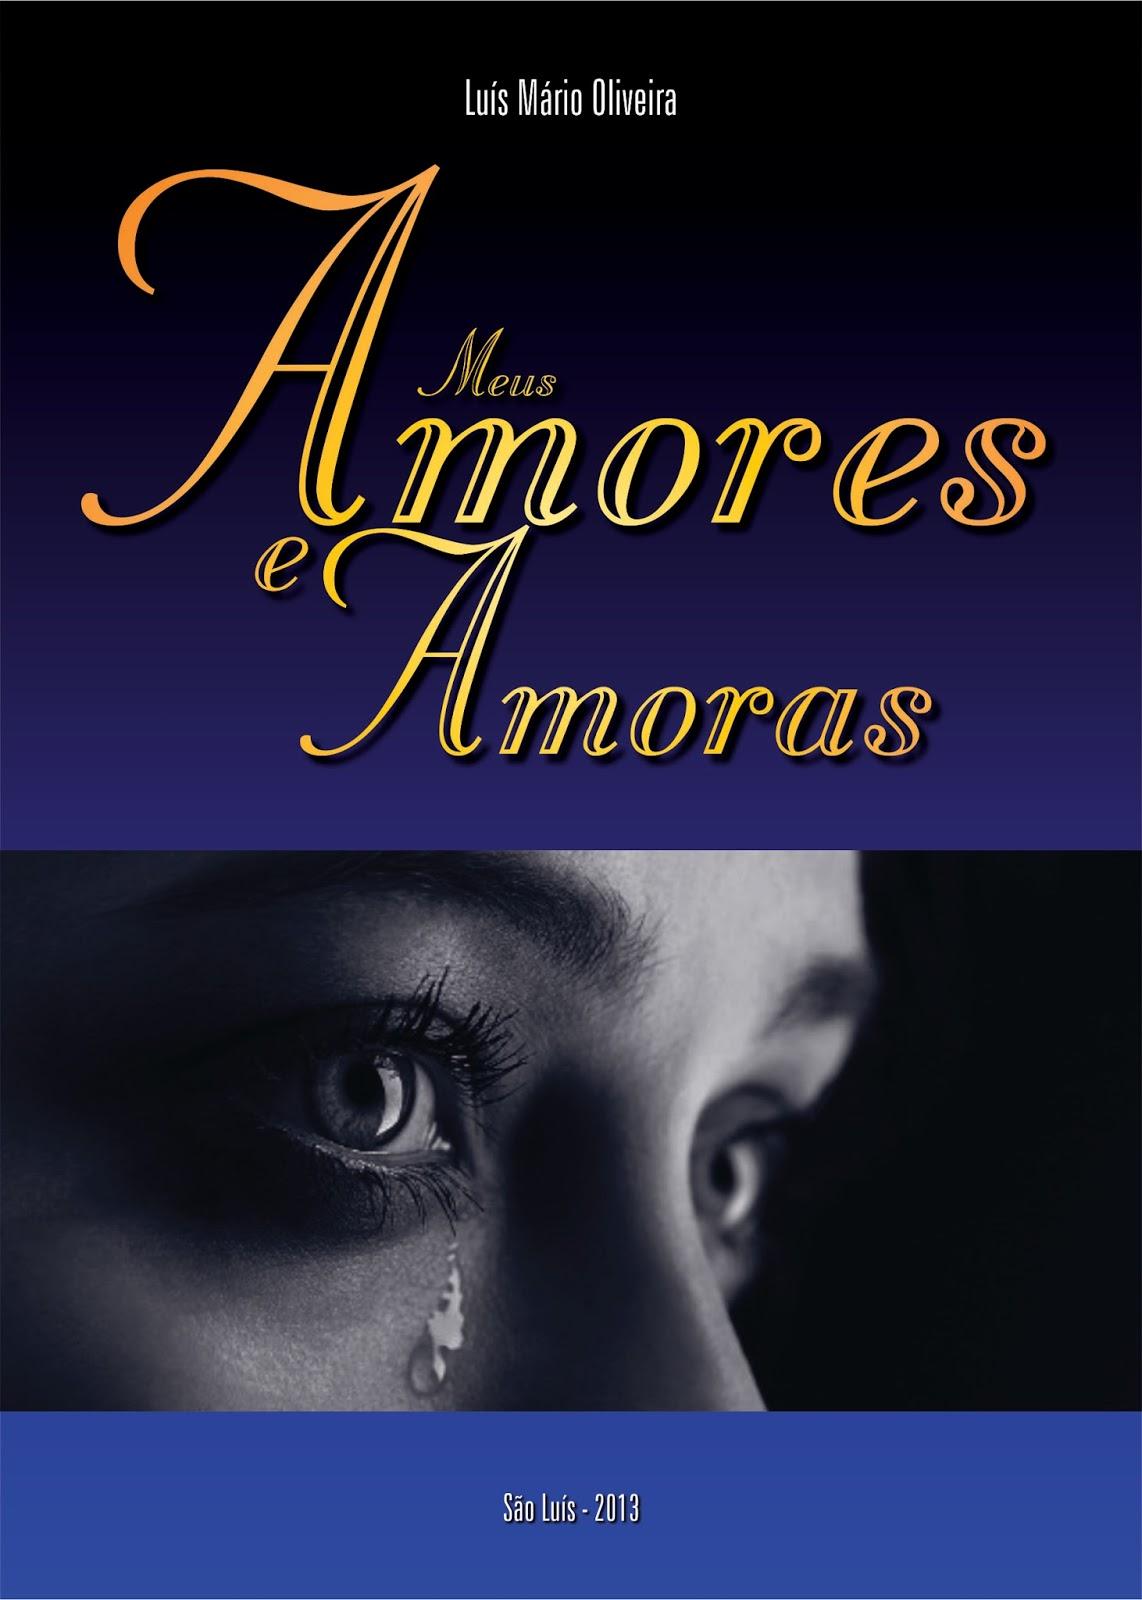 Antologia de manoelserrao1234 luis mrio de oliveira poeta maranhense livro poesias amores amoras cineasta e ator fandeluxe Gallery